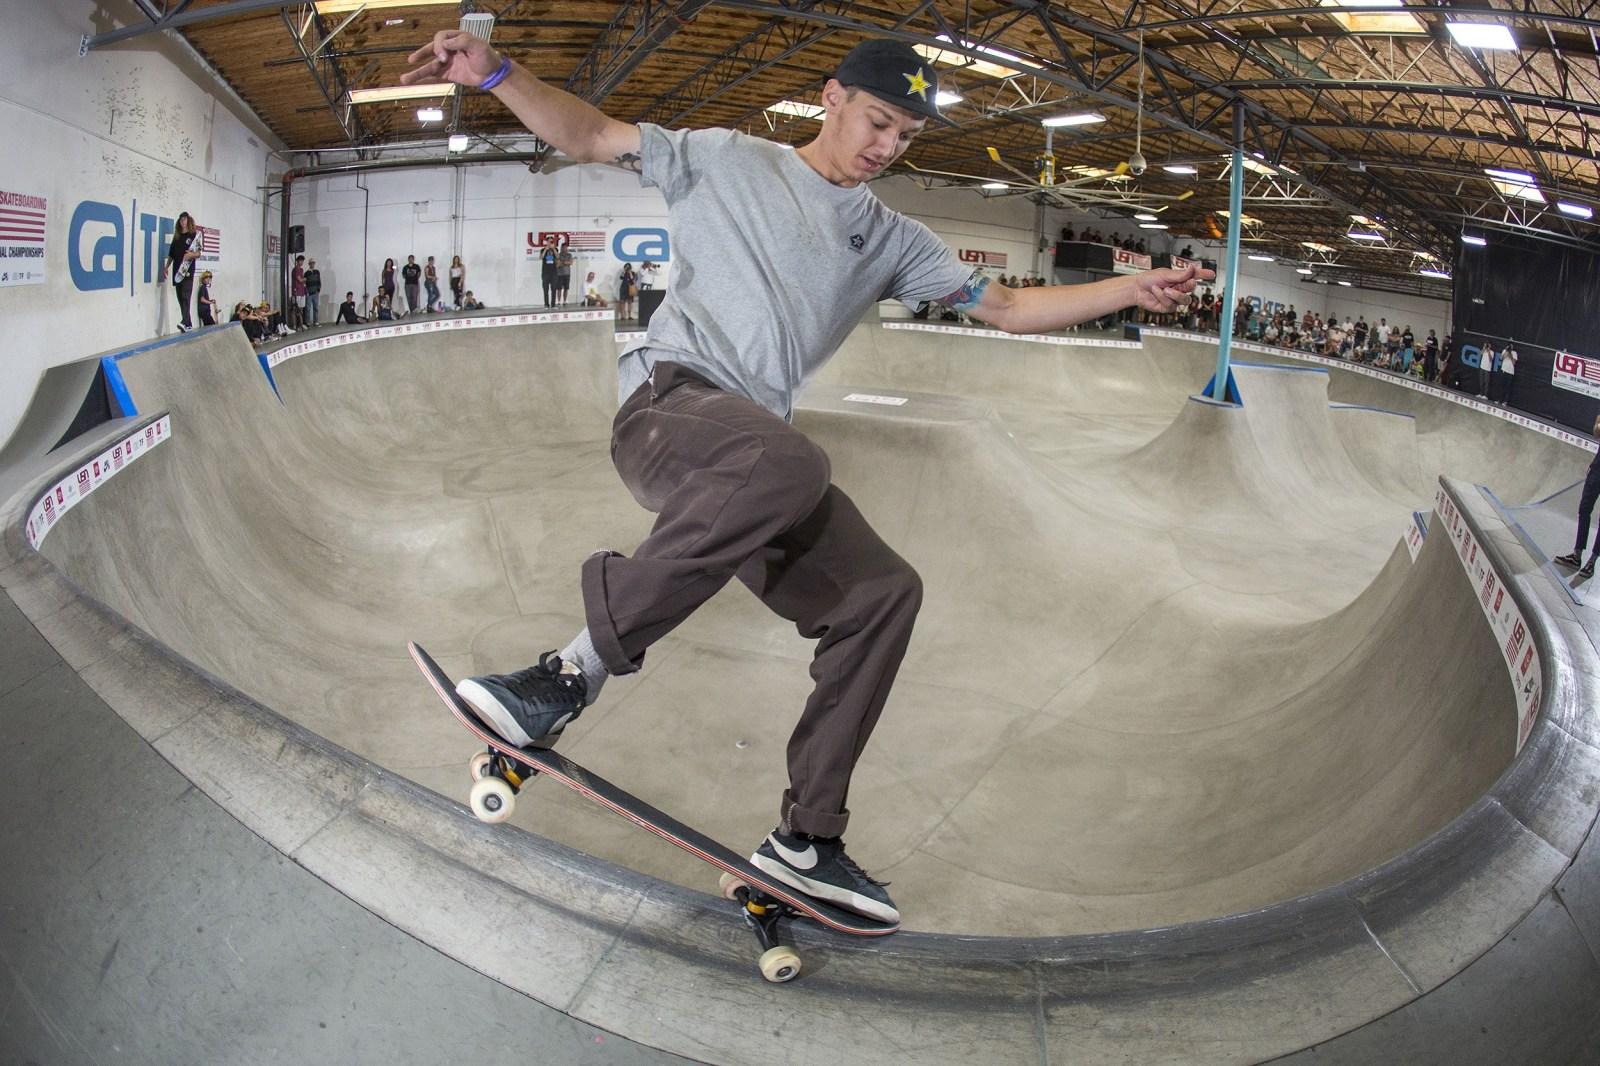 skateboard olympique